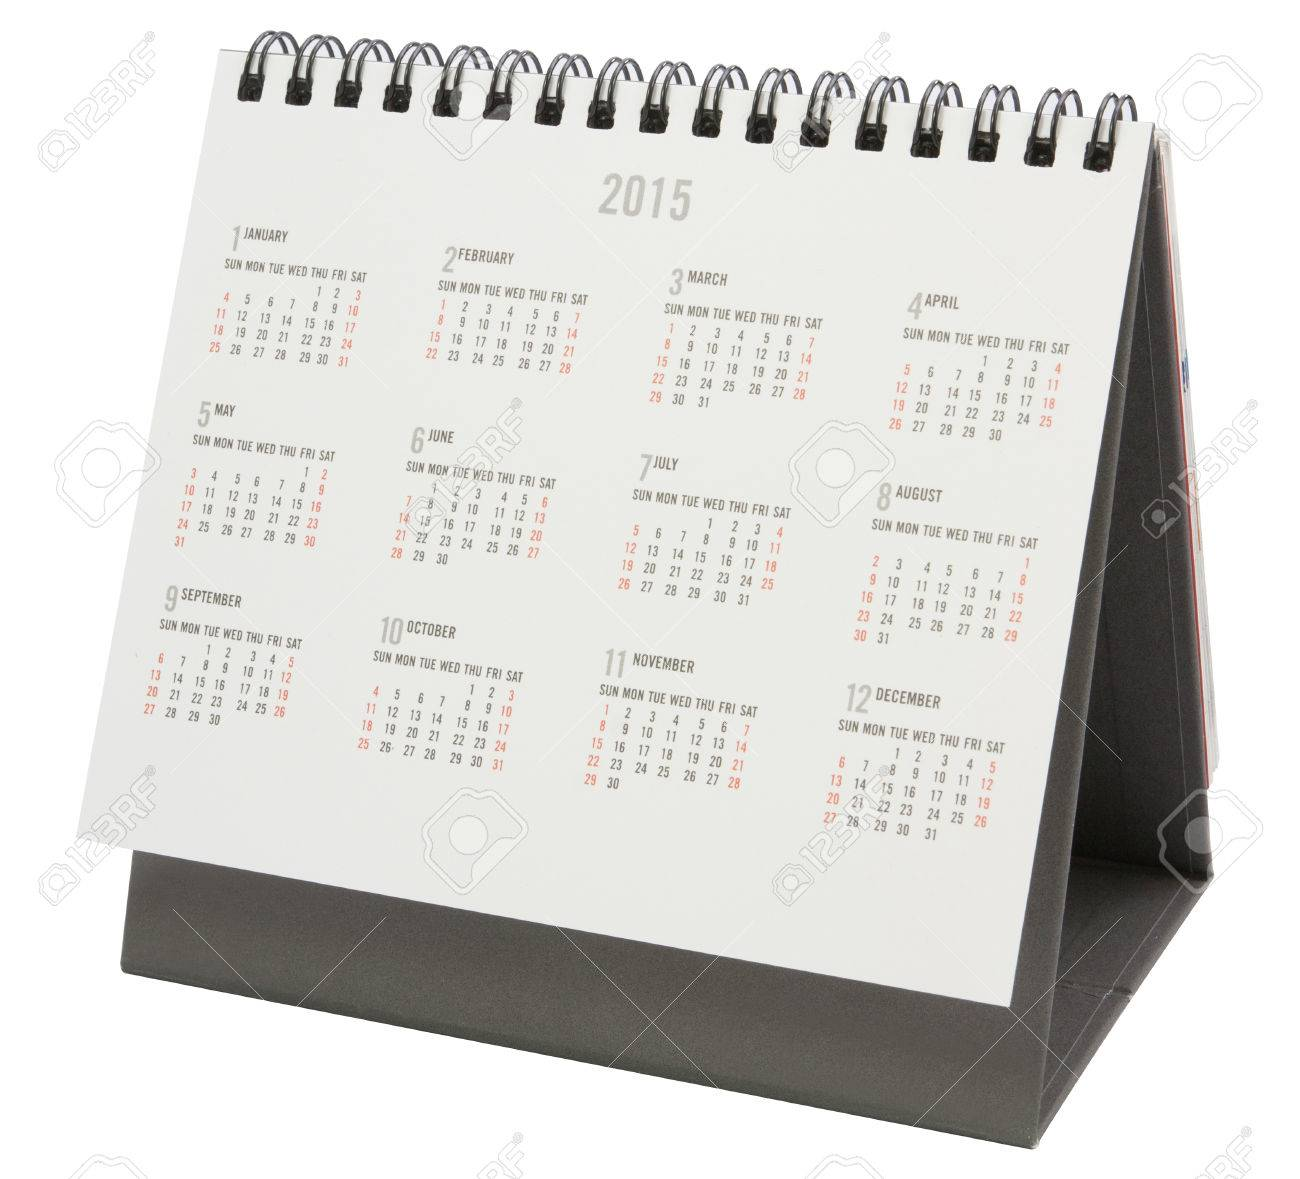 desk calendar 2015 isolated on white file includes a excellent rh 123rf com desk calendar 2018 nfl desk calendar 2018 2019